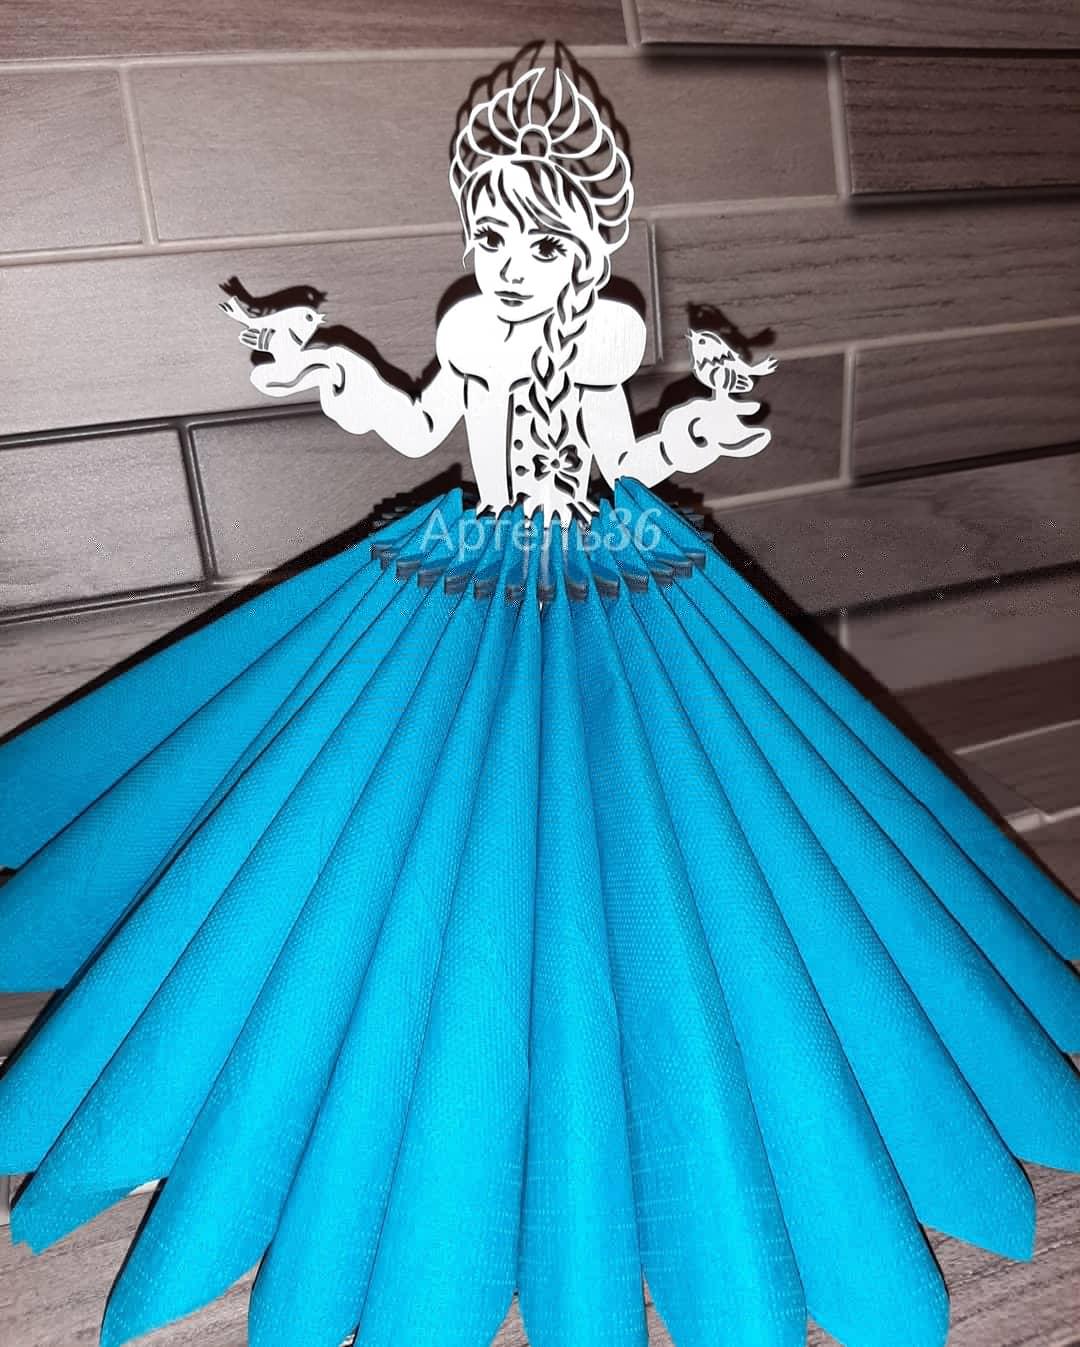 Laser Cut Decorative Wooden Tabletop Snow Maiden Napkin Holder Free Vector